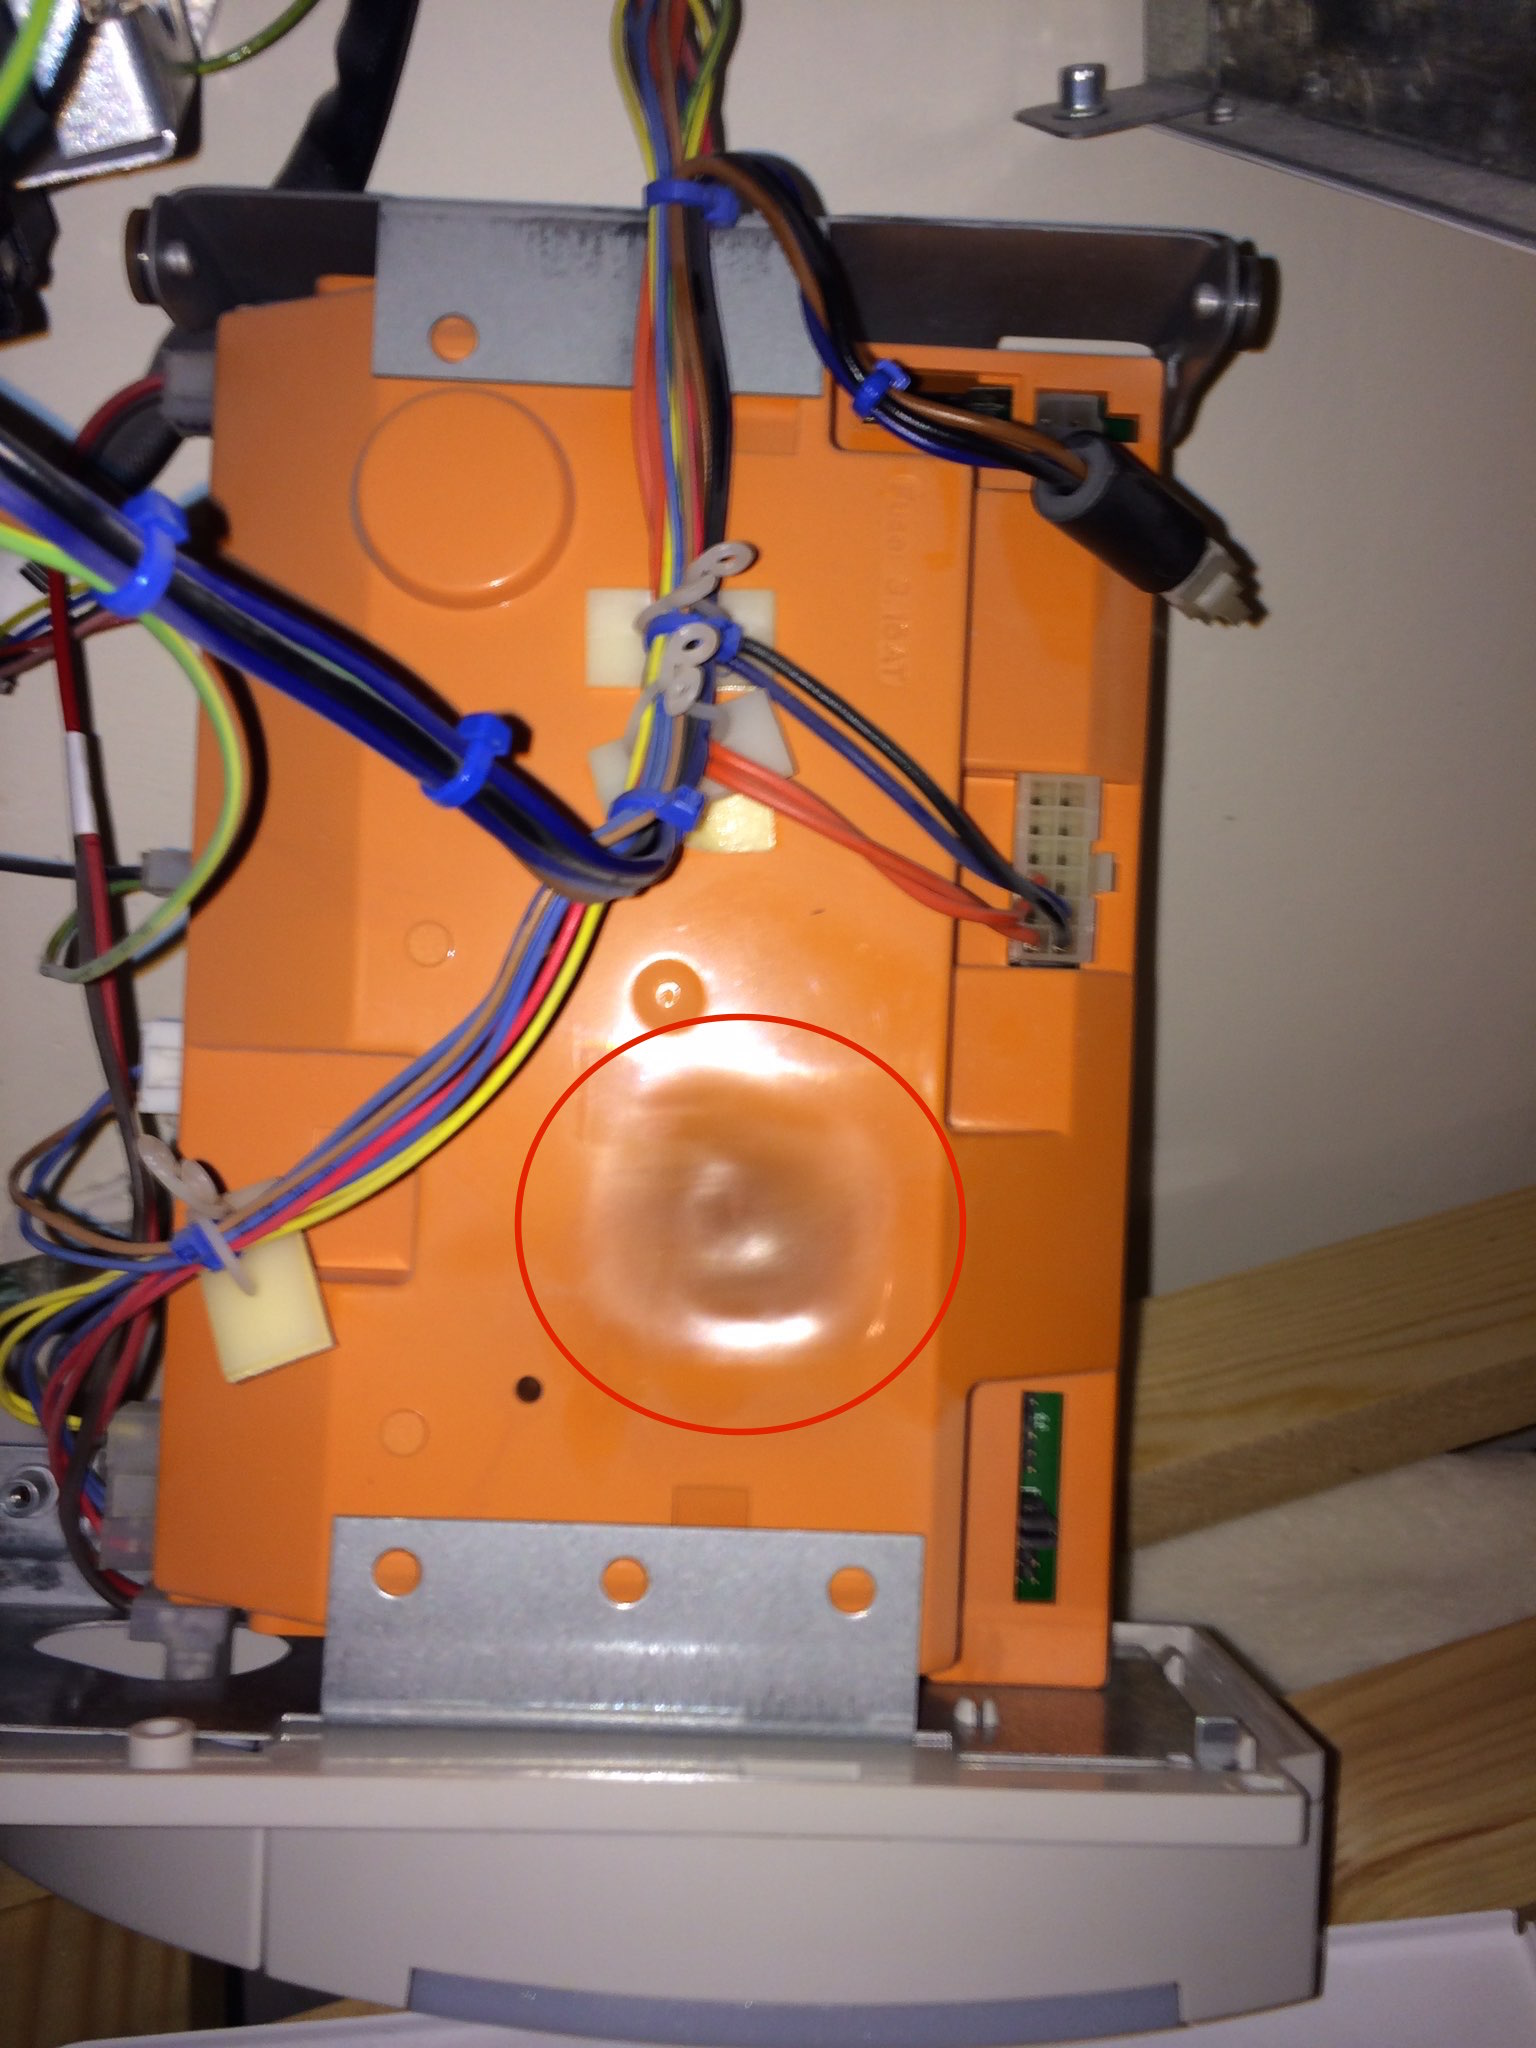 Ideal Boiler Specialist Expert Repair Circuit Board Printed Icos Failed